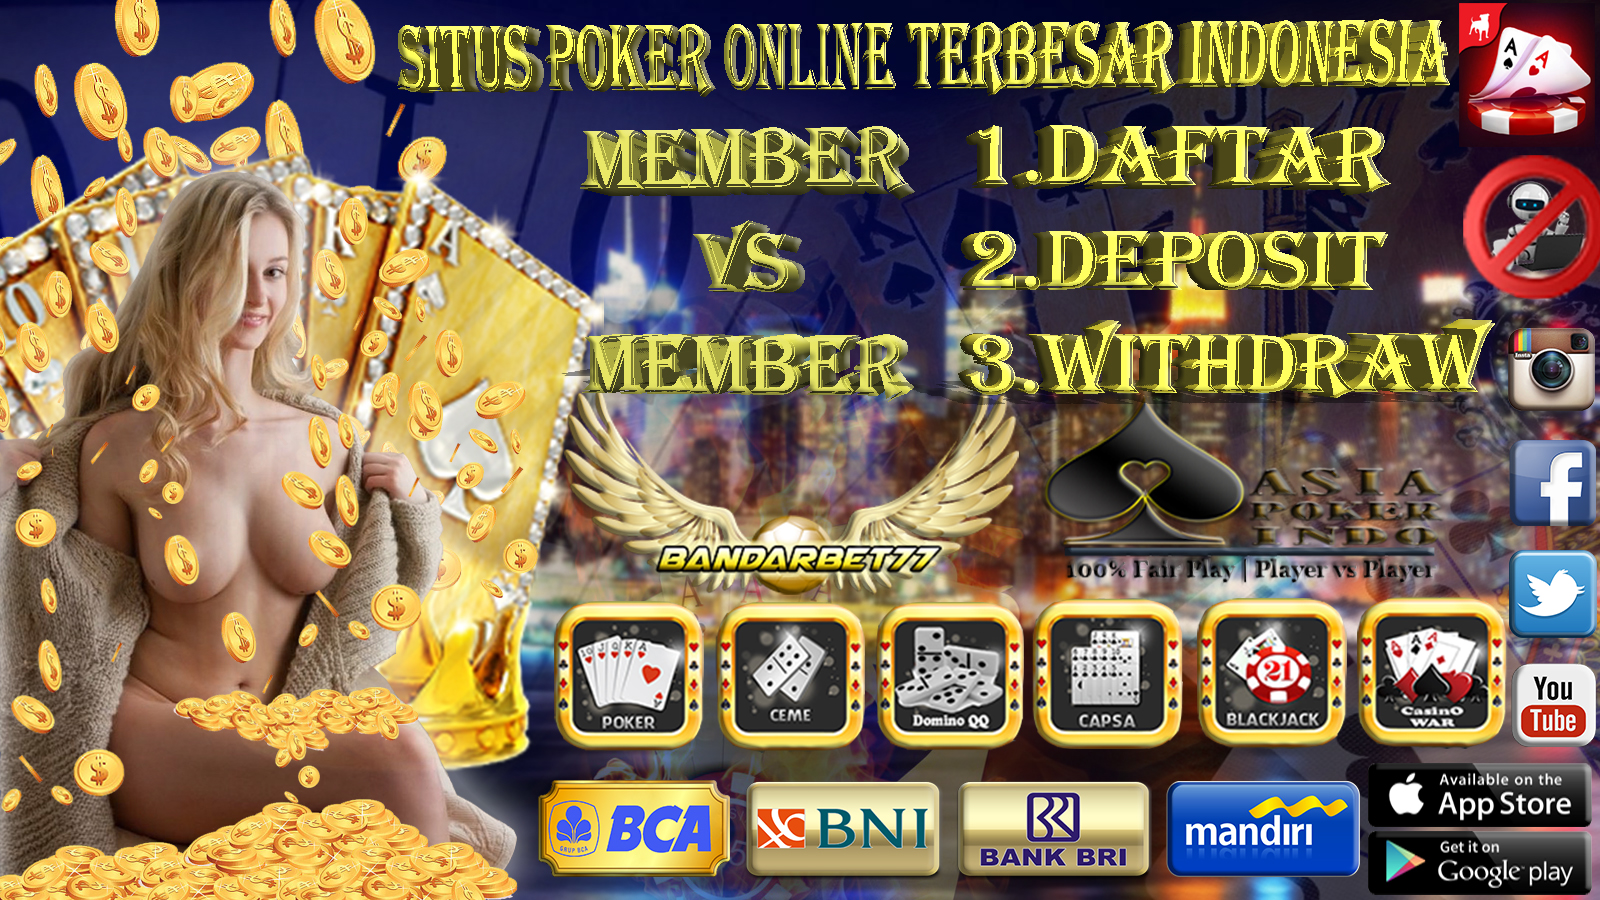 Daftar Website Situs Poker Tanpa Bot Online Indonesia